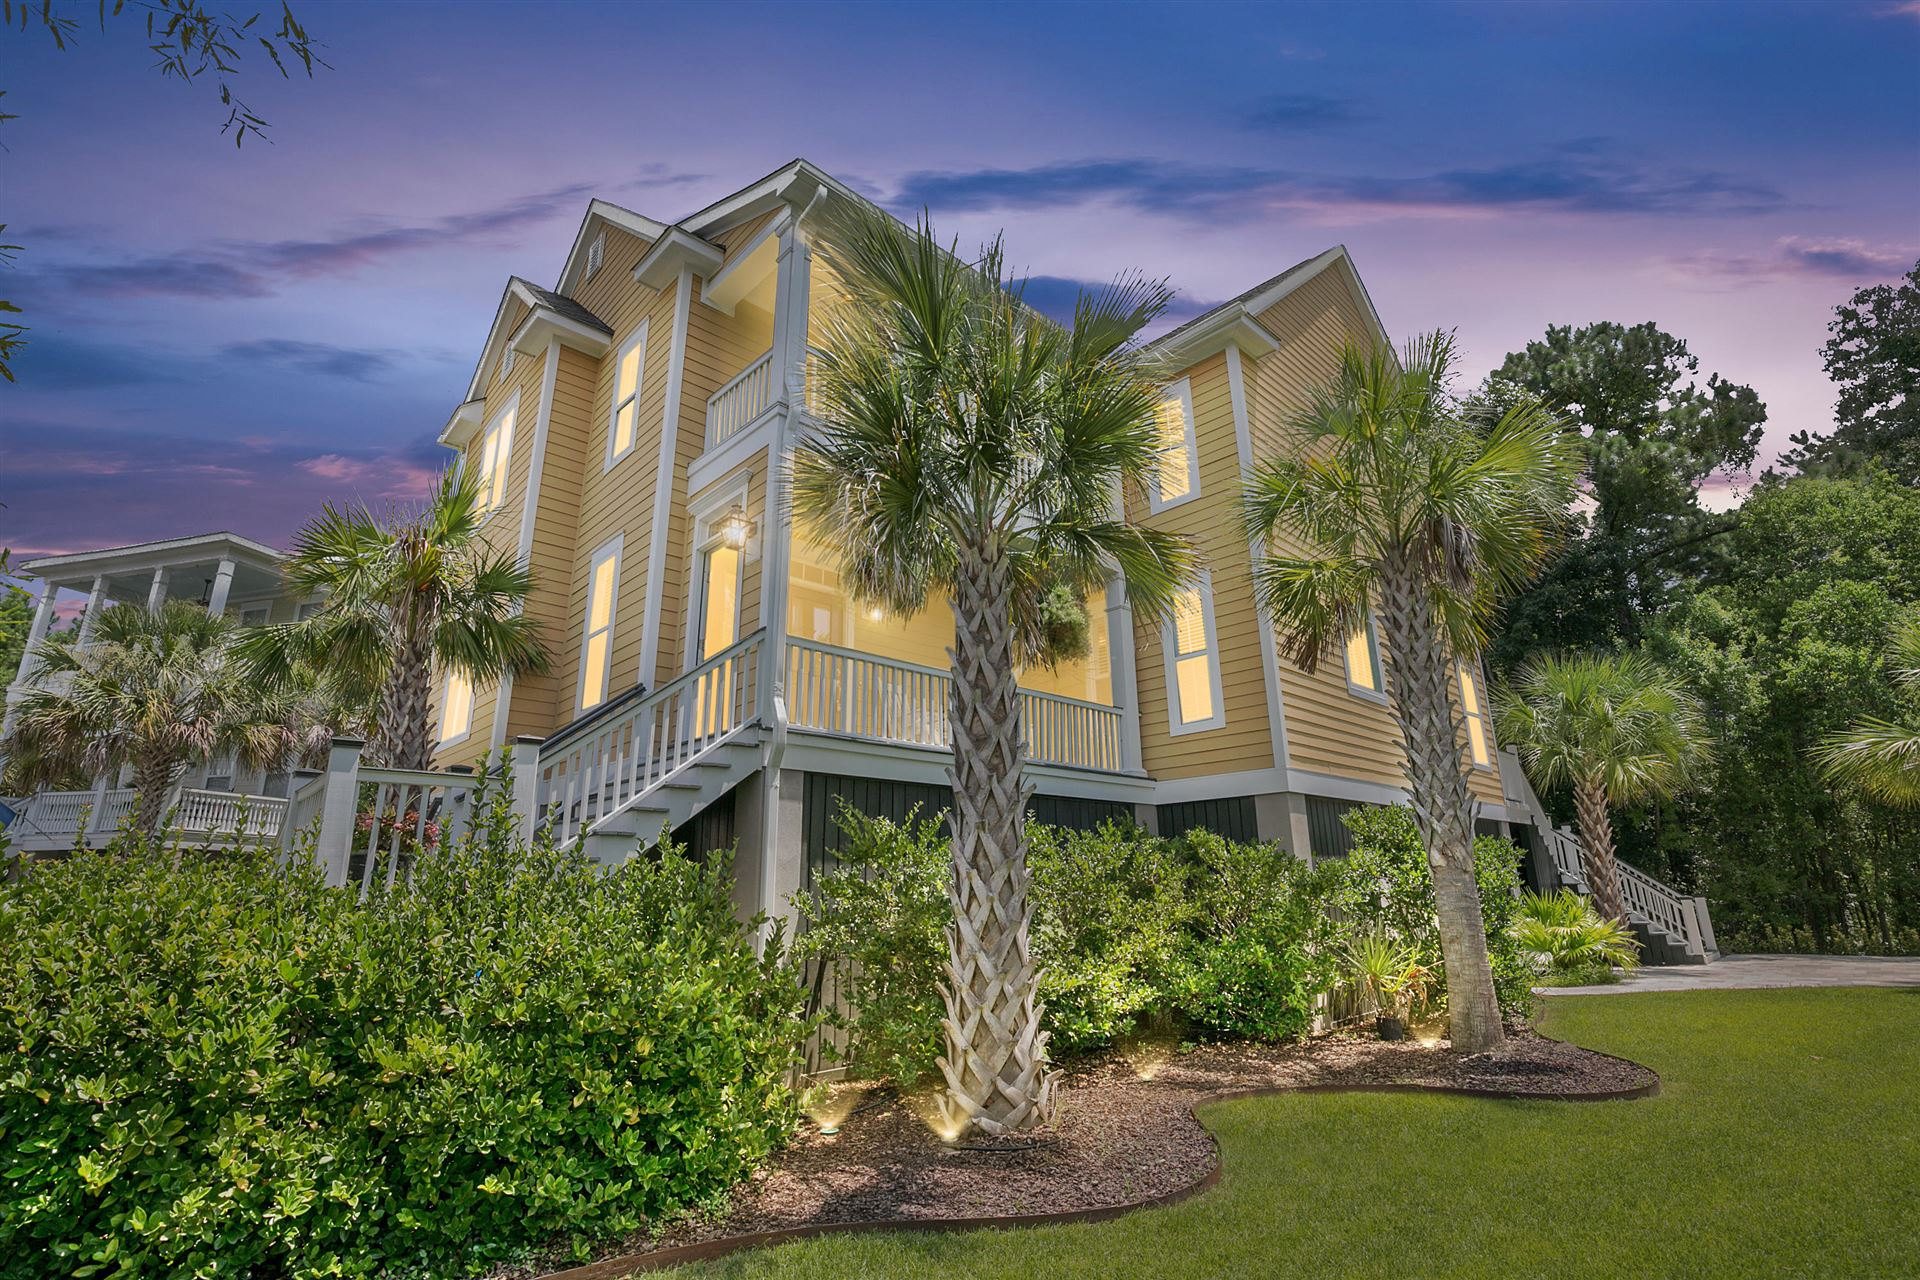 Photo of 151 Sandshell Drive, Charleston, SC 29492 (MLS # 20014086)